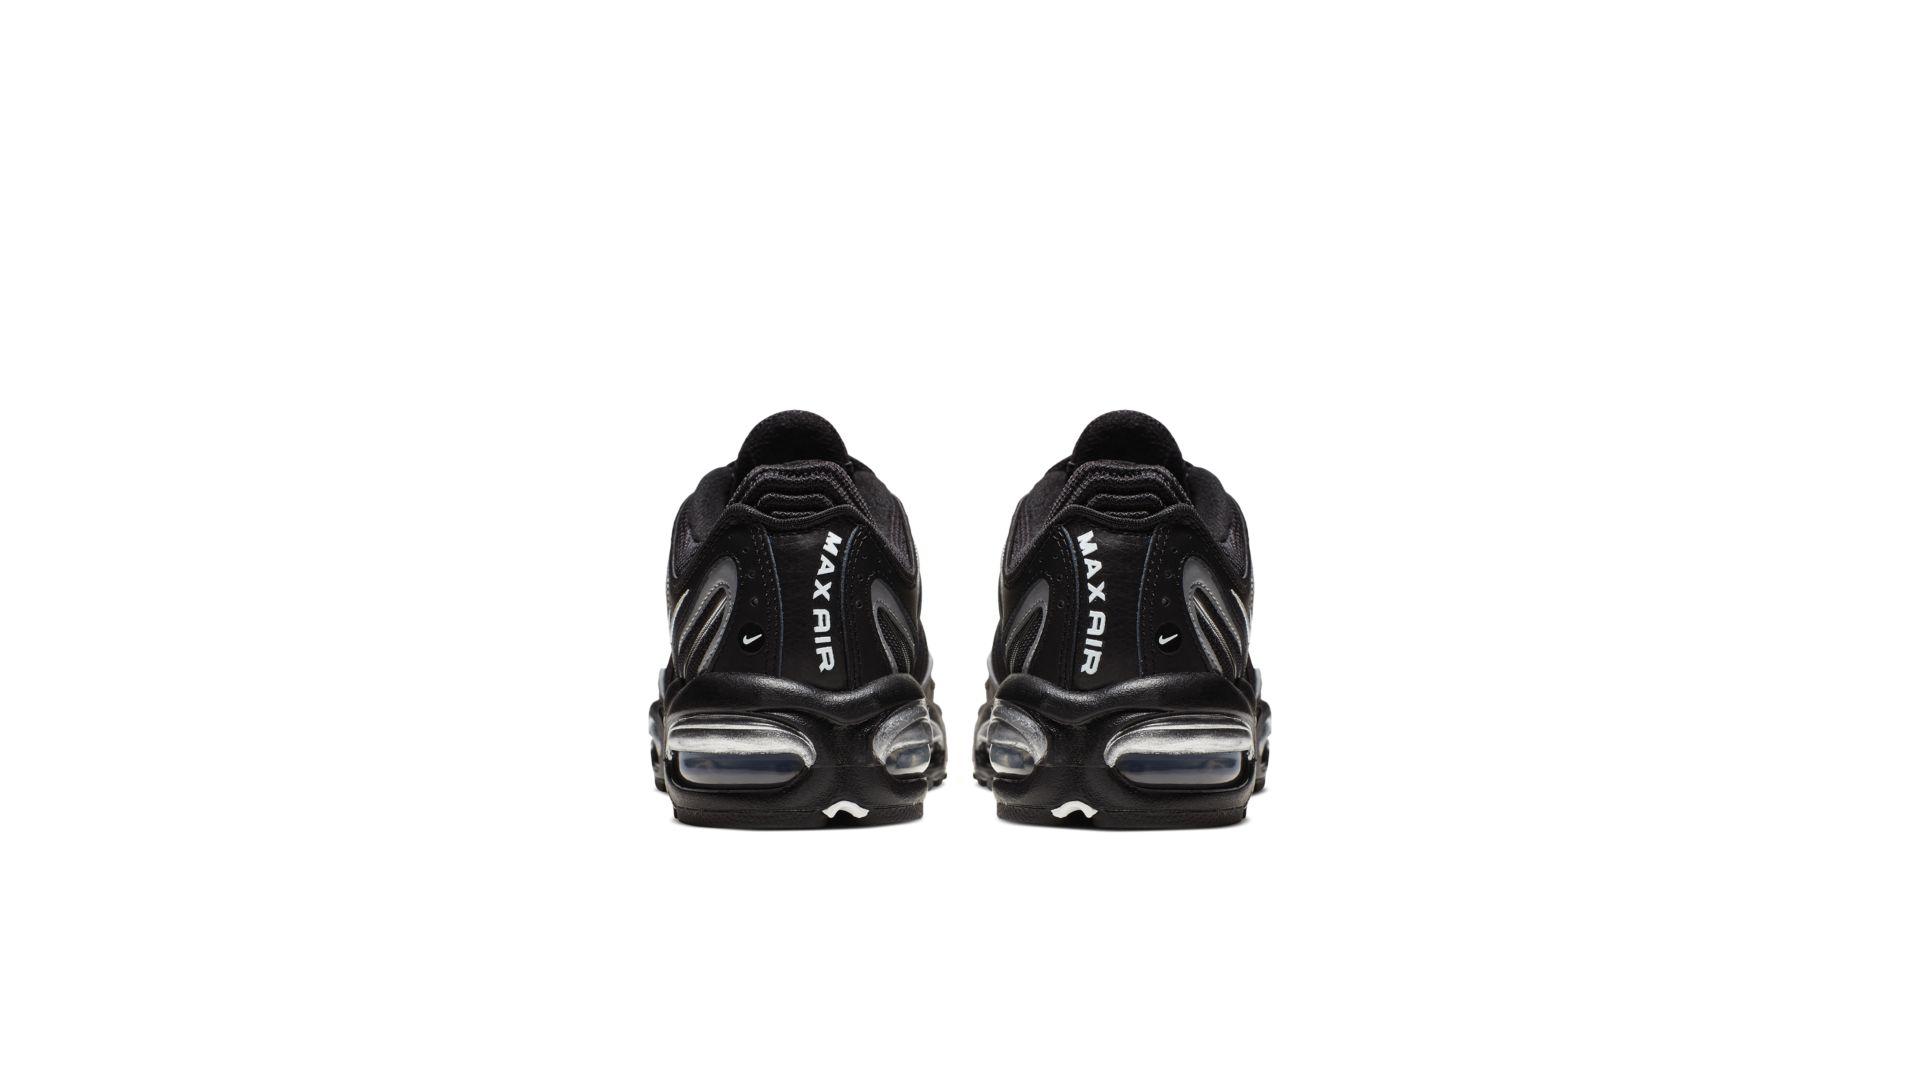 Nike Air Max Tailwind 4 Black Metallic Silver (AQ2567-003)